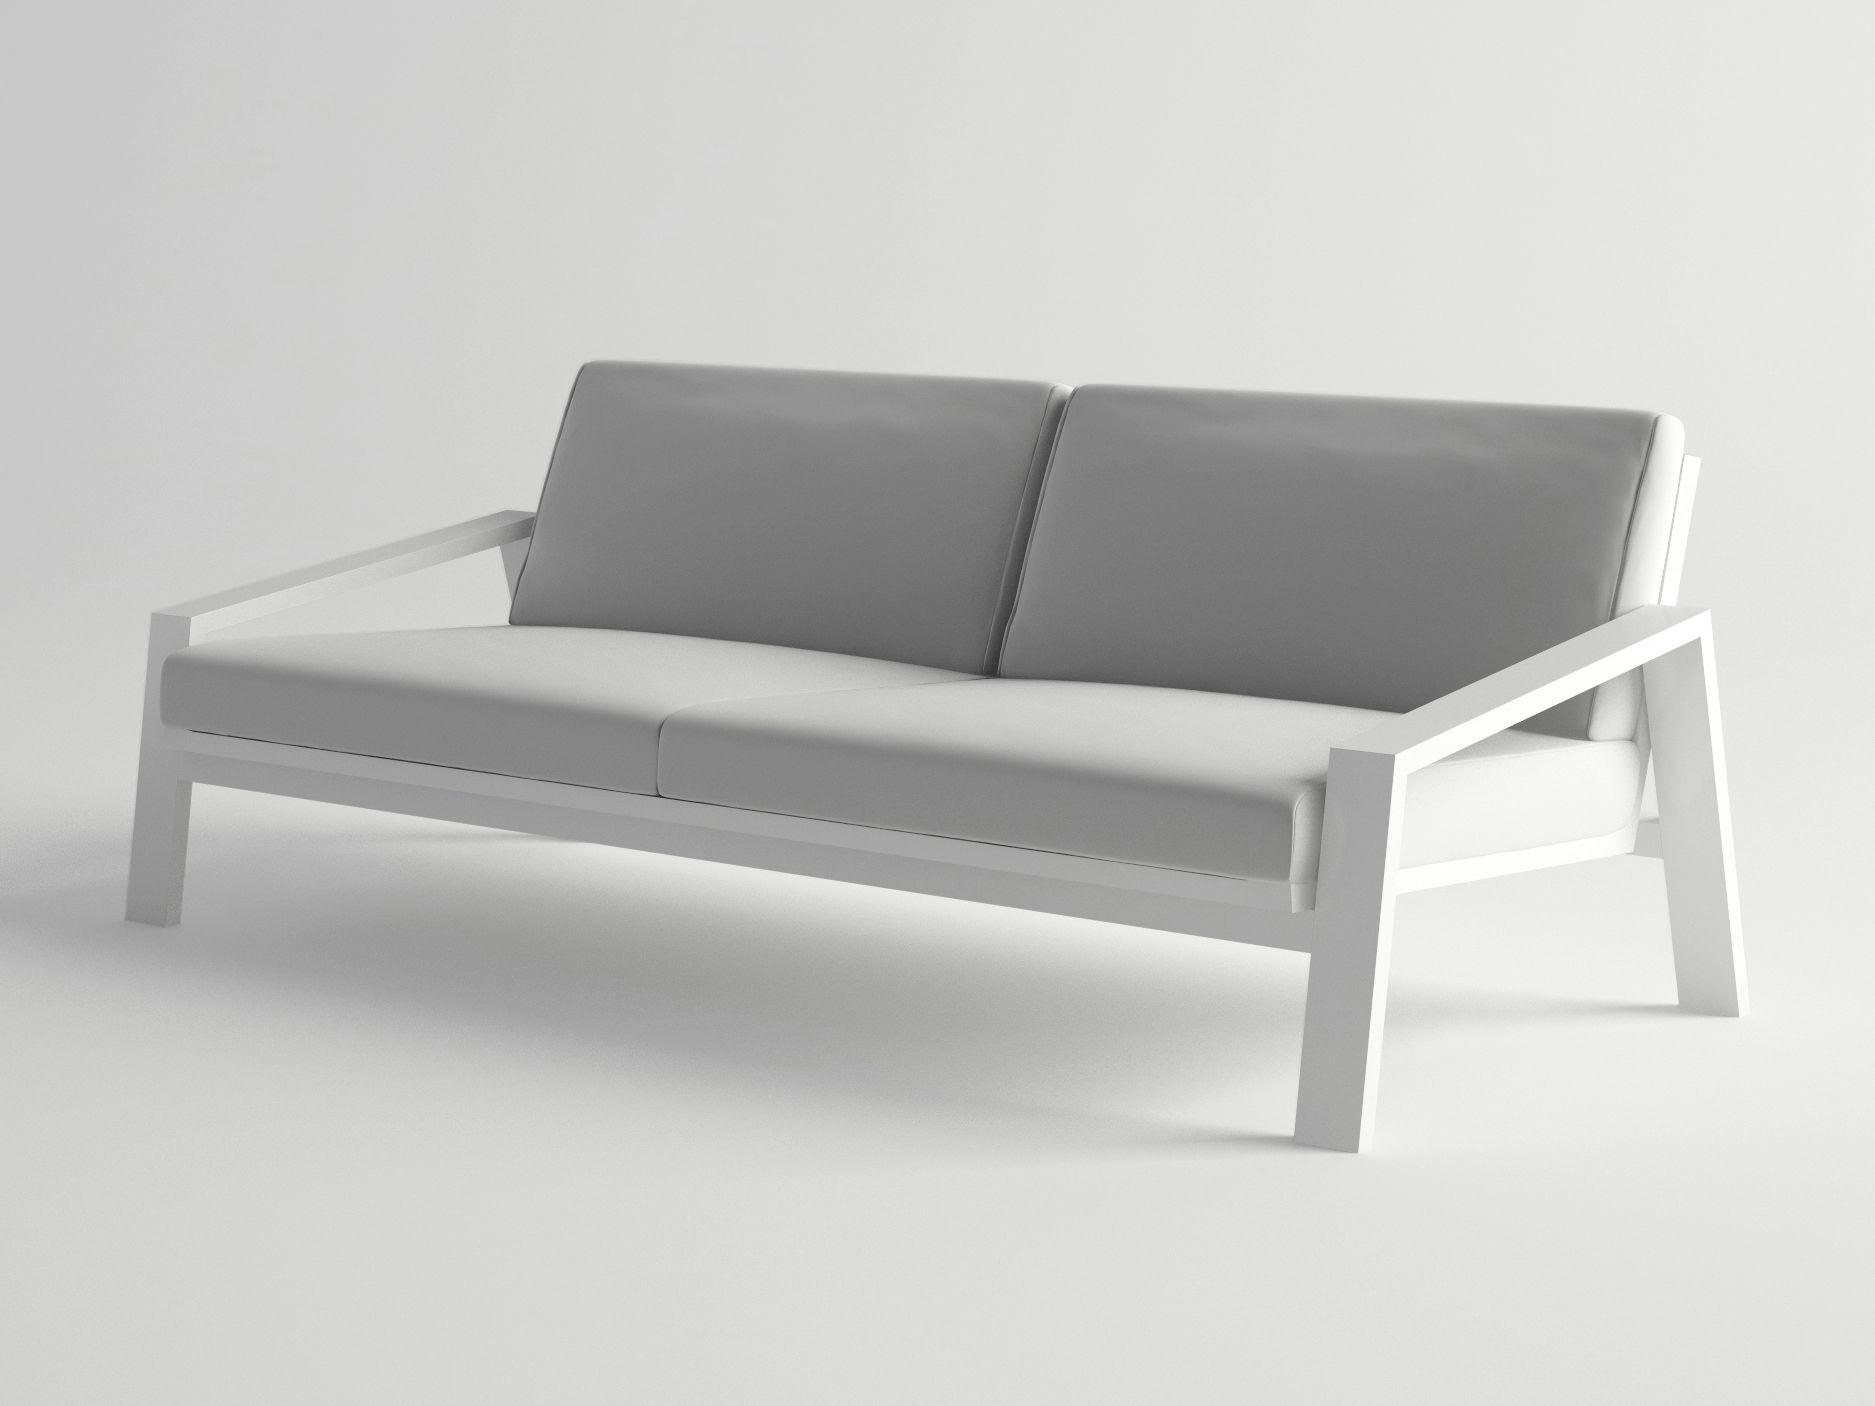 Garden sofa PULVIS Collection by 10Deka design George ...